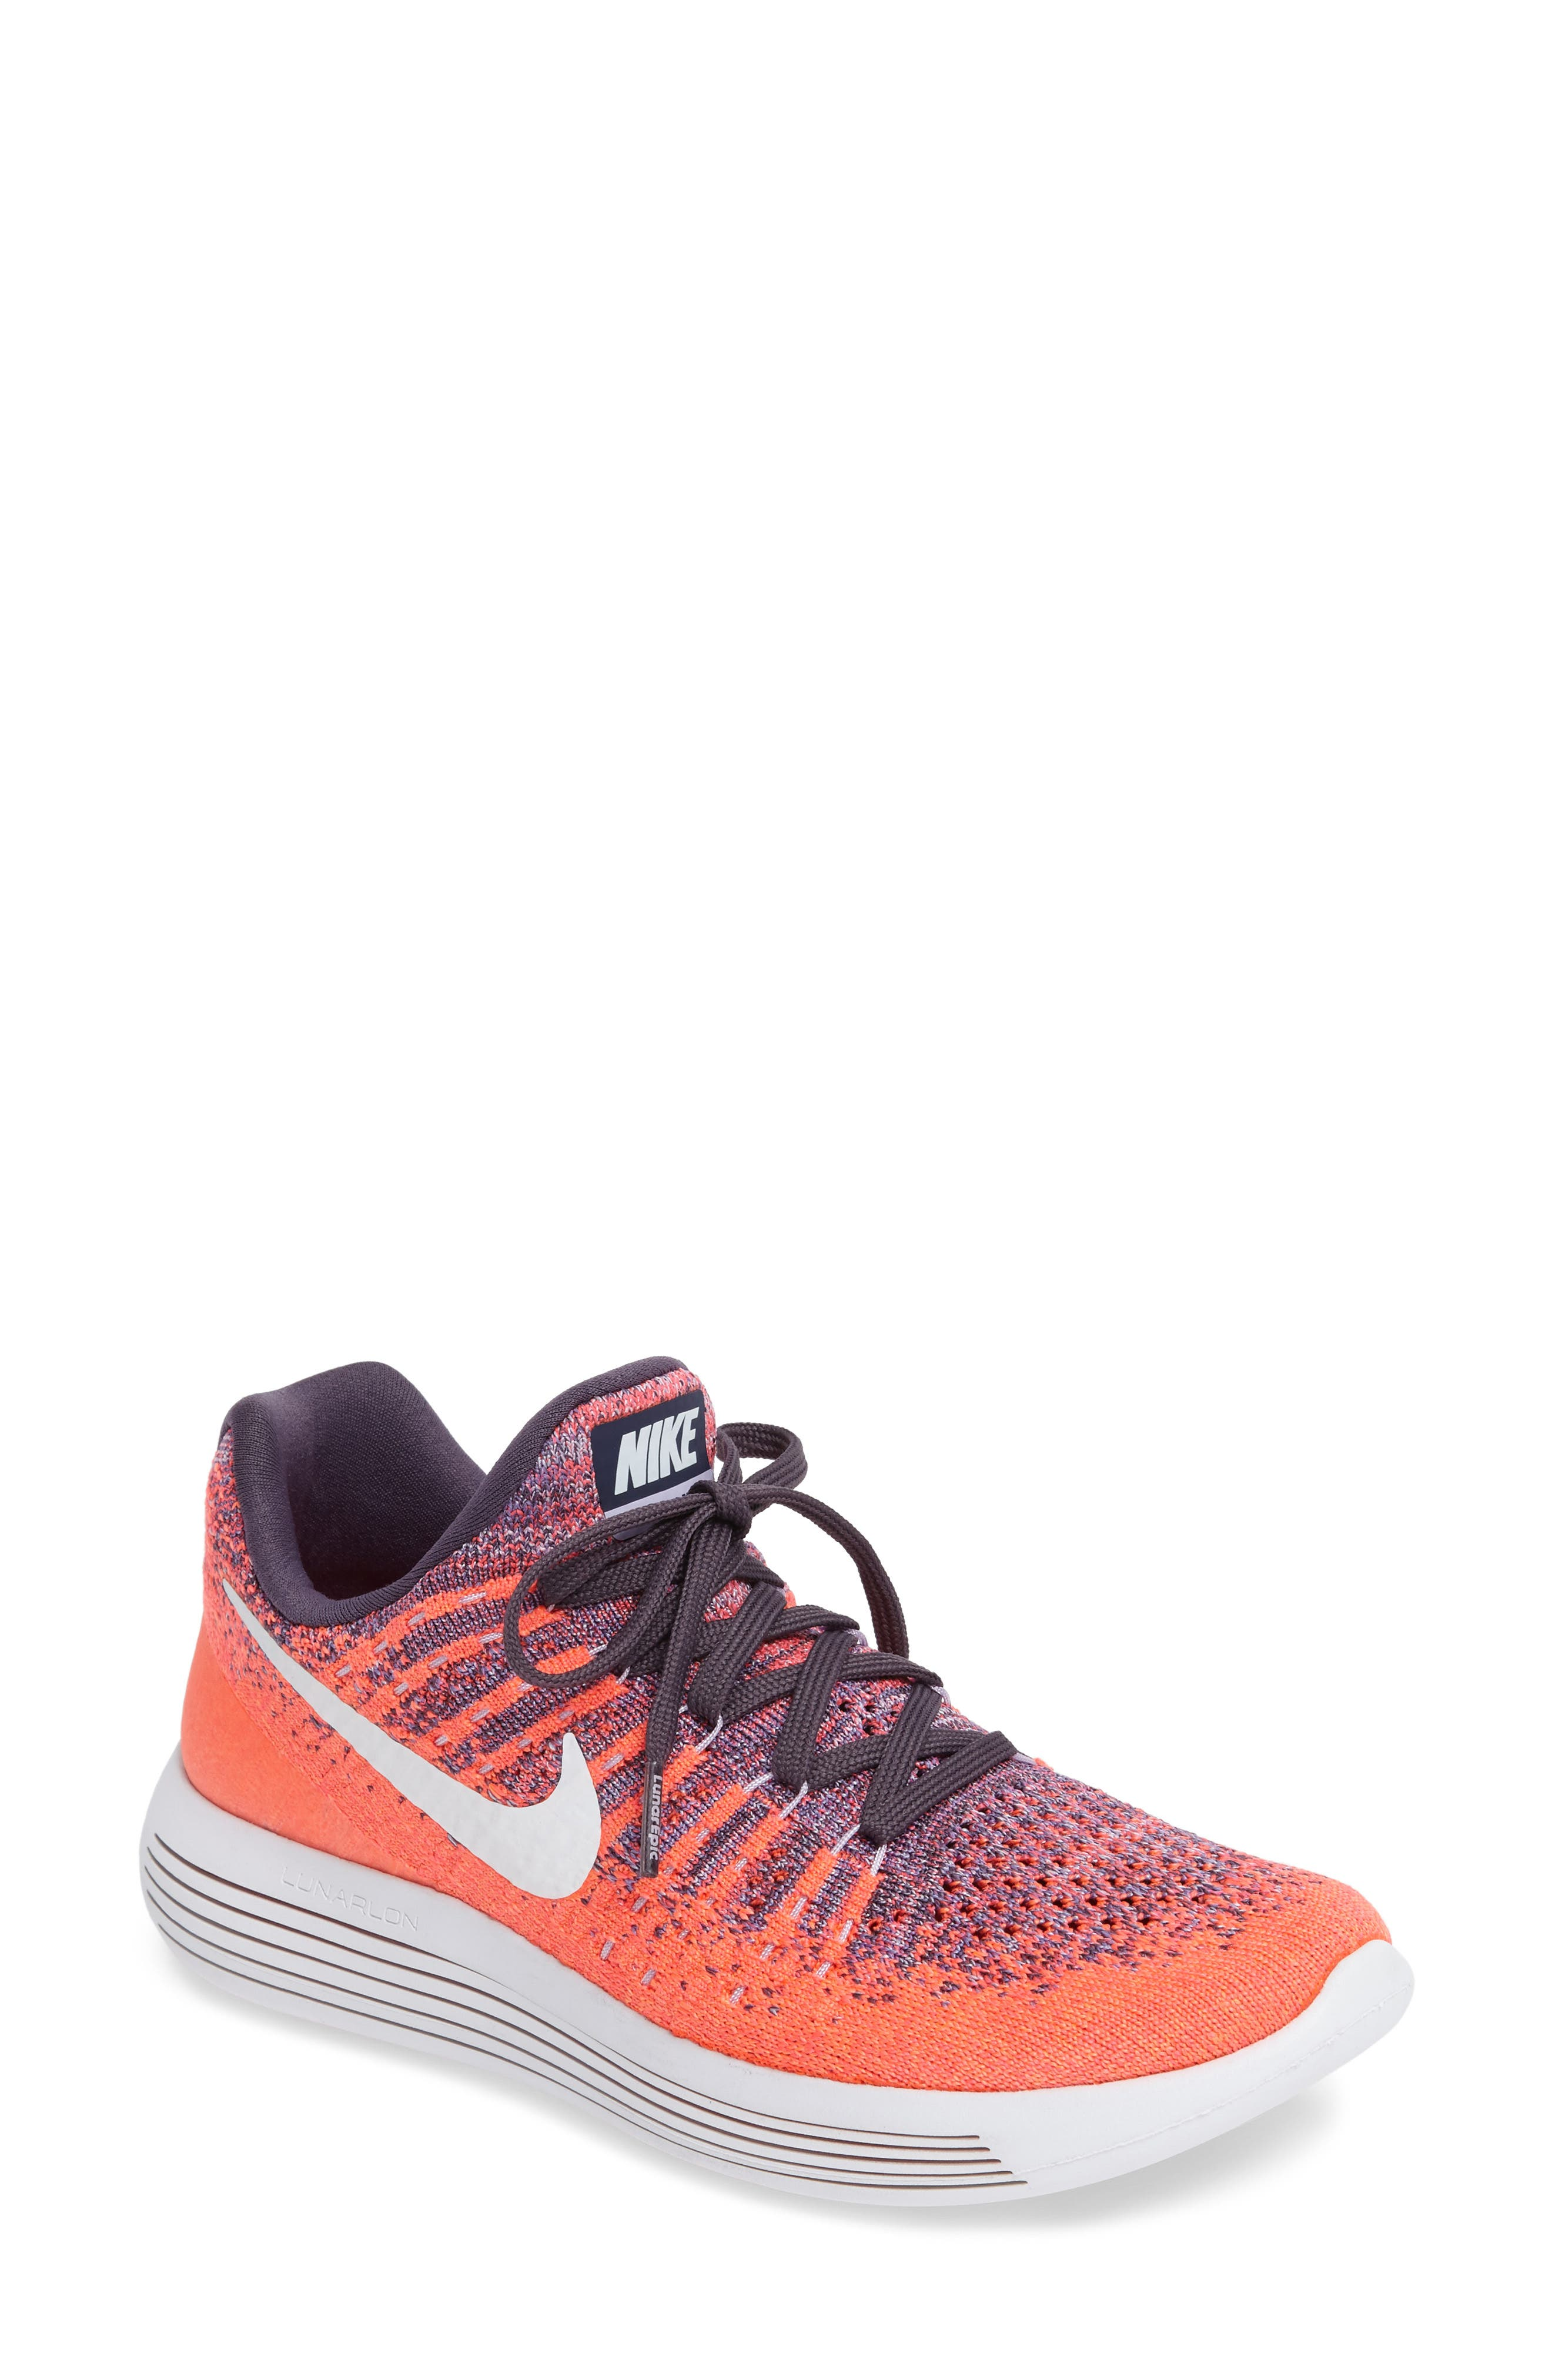 Nike LunarEpic Low Flyknit 2 Running Shoe (Women)